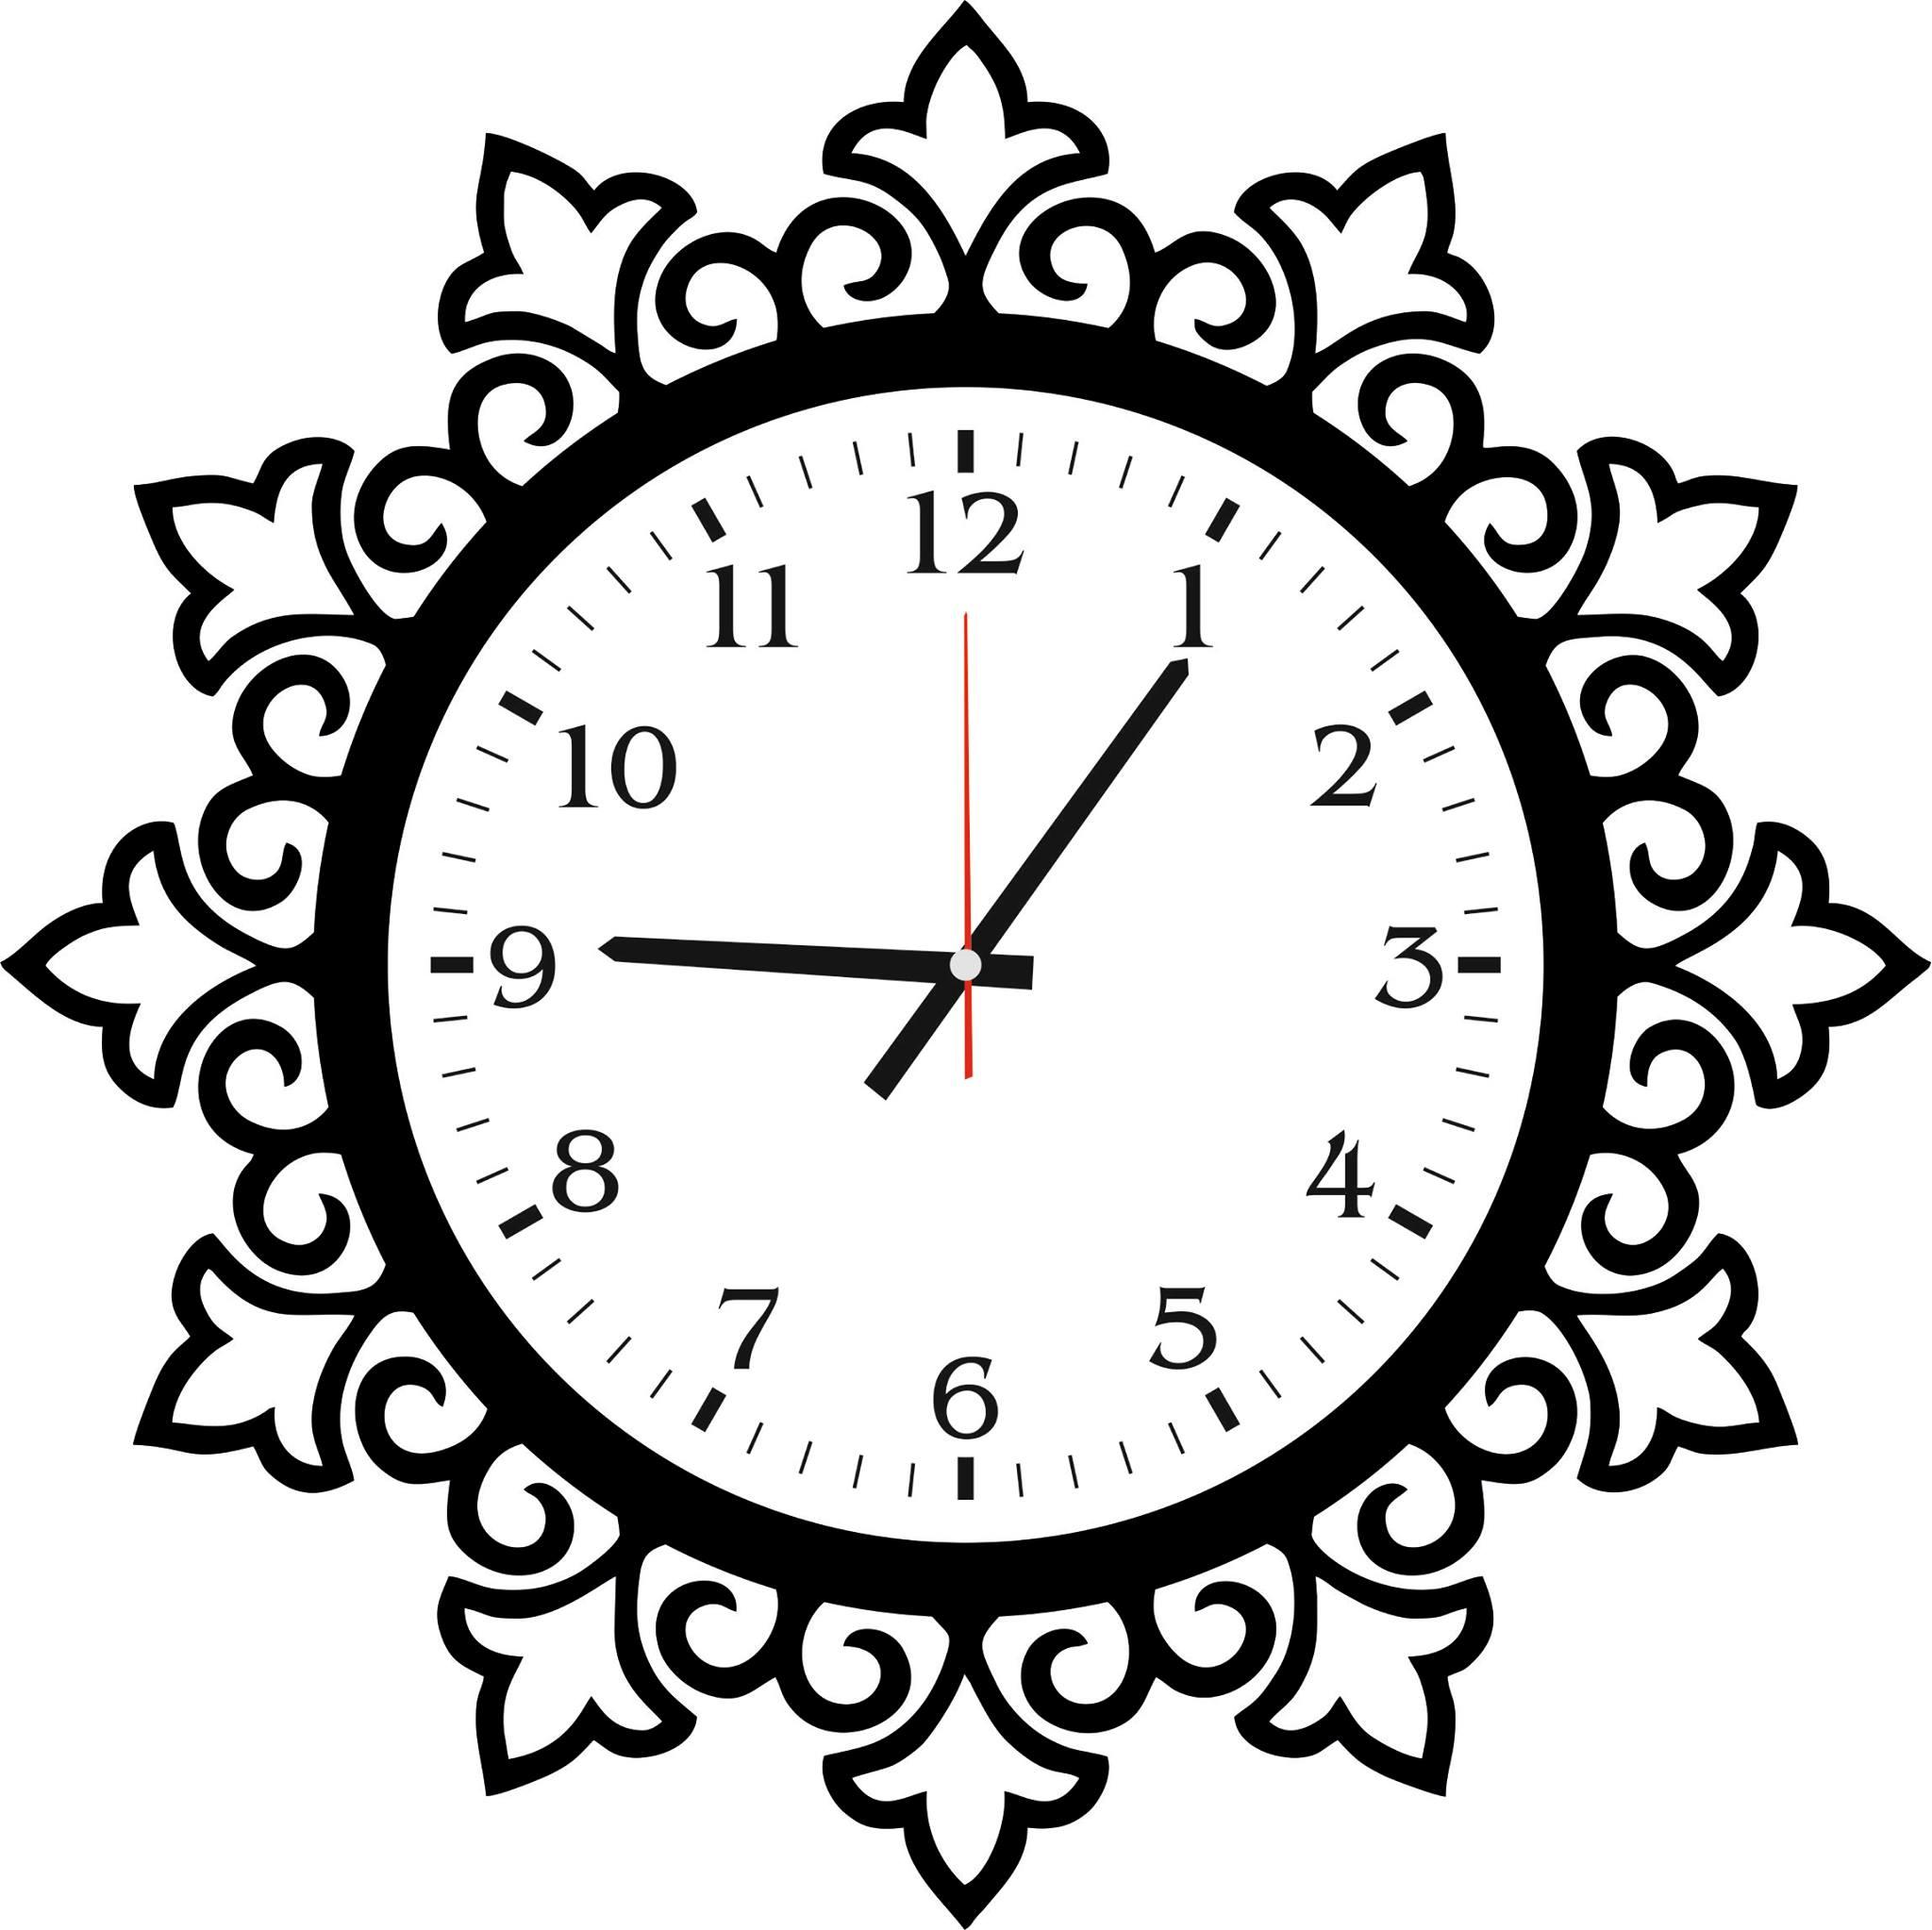 Art Wall Clock Abstract Design jpg Image